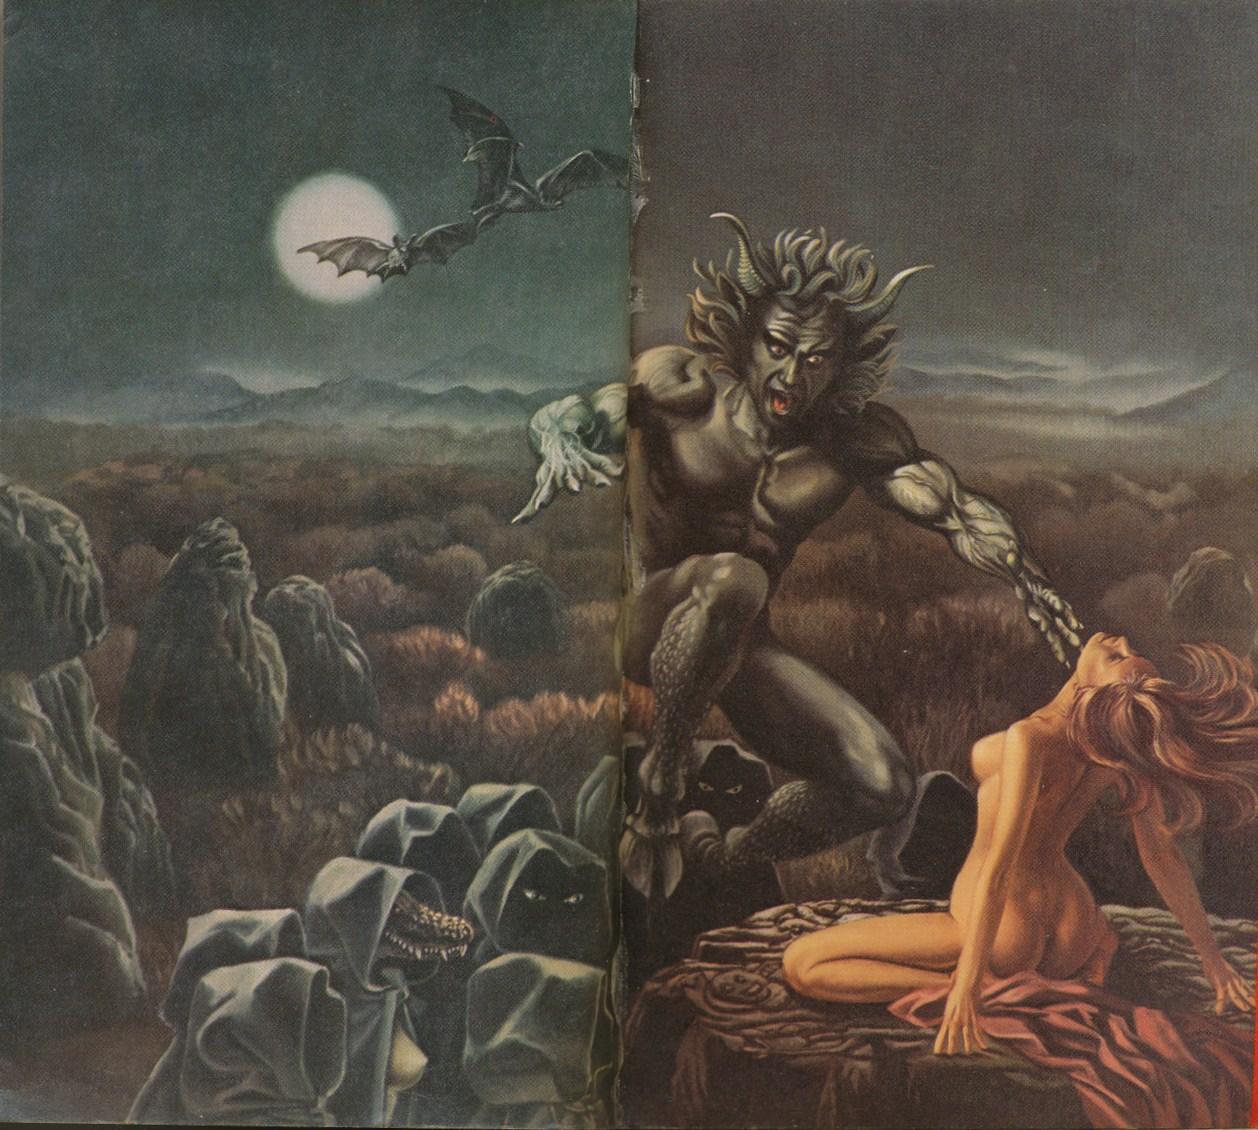 Rowena Morrill vintage cover art